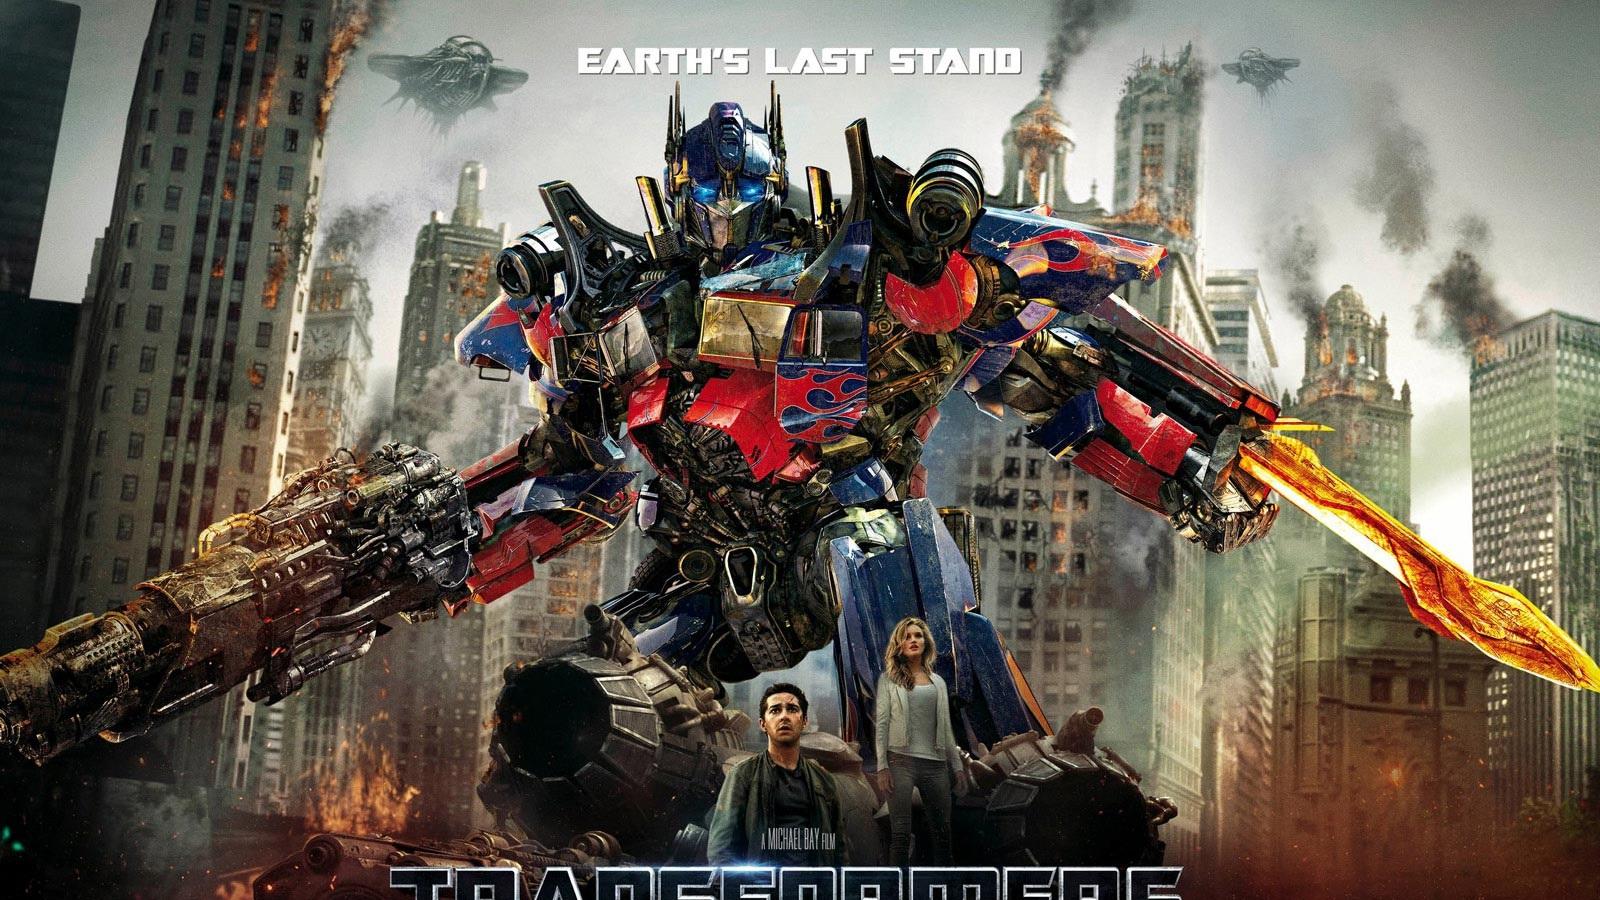 2011 Transformers 3 Wallpaper 1600x900 Resolution